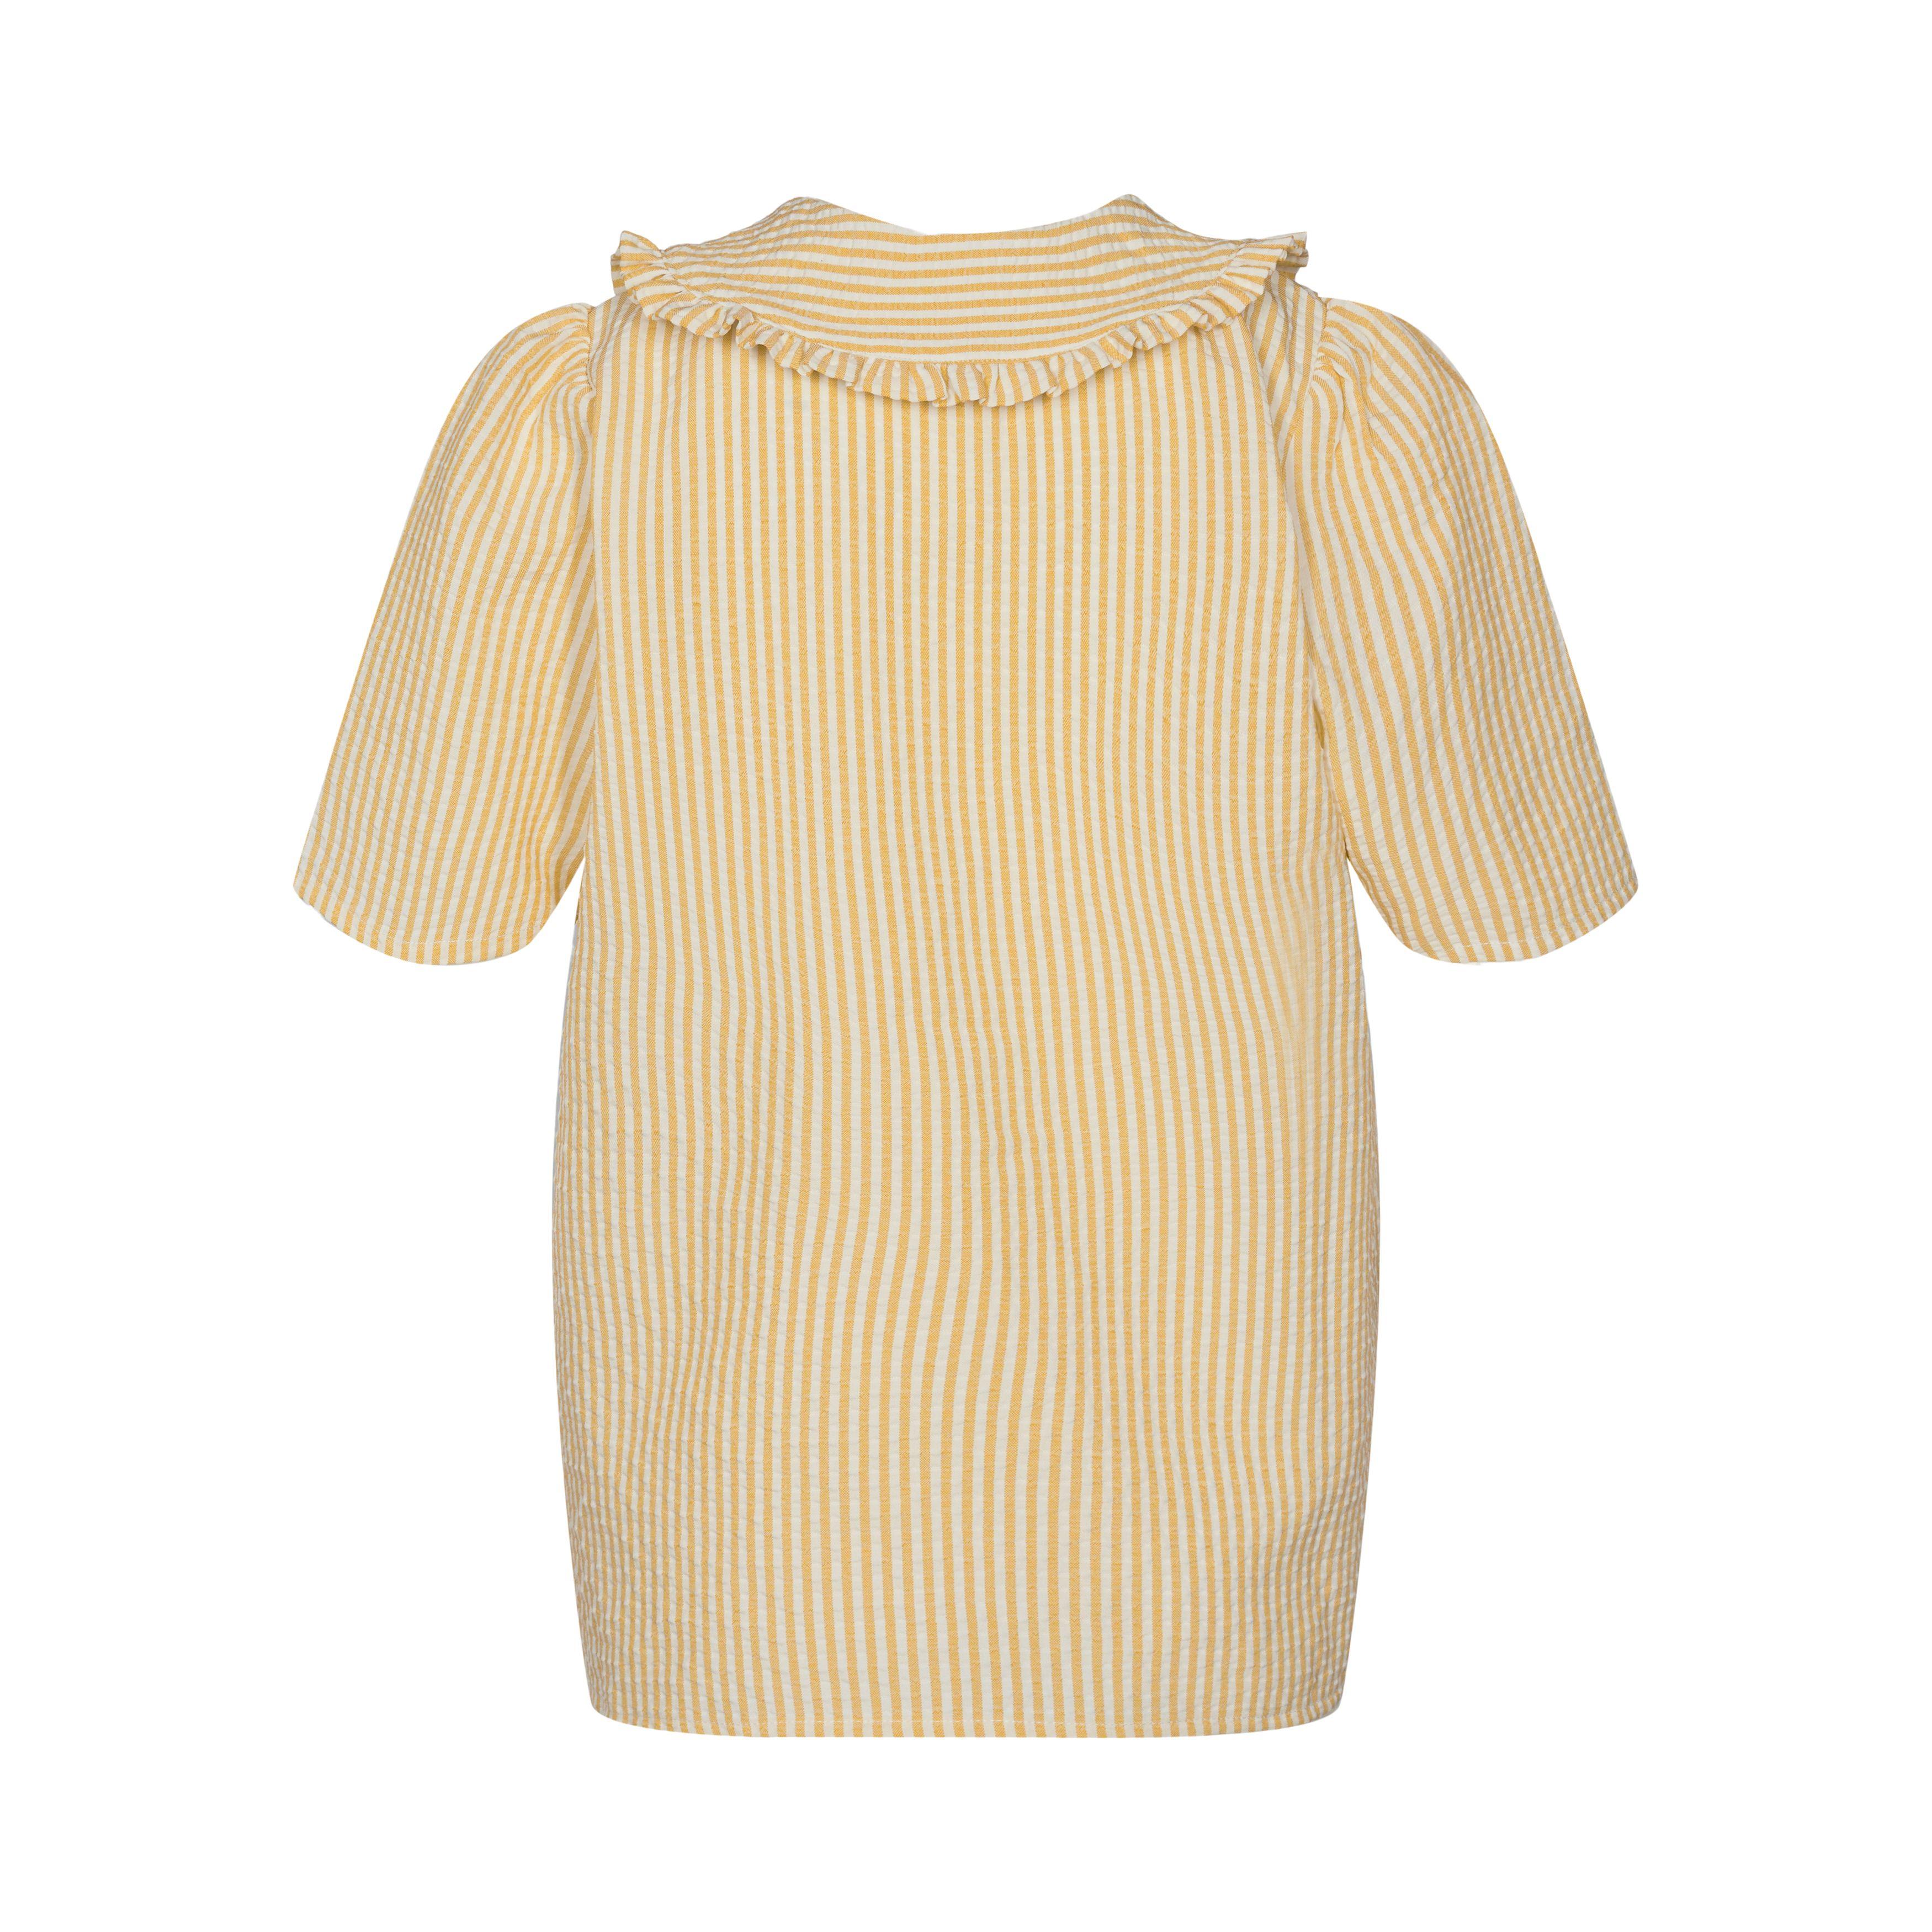 Petit by Sofie Schnoor Kenia bluse, yellow, 116